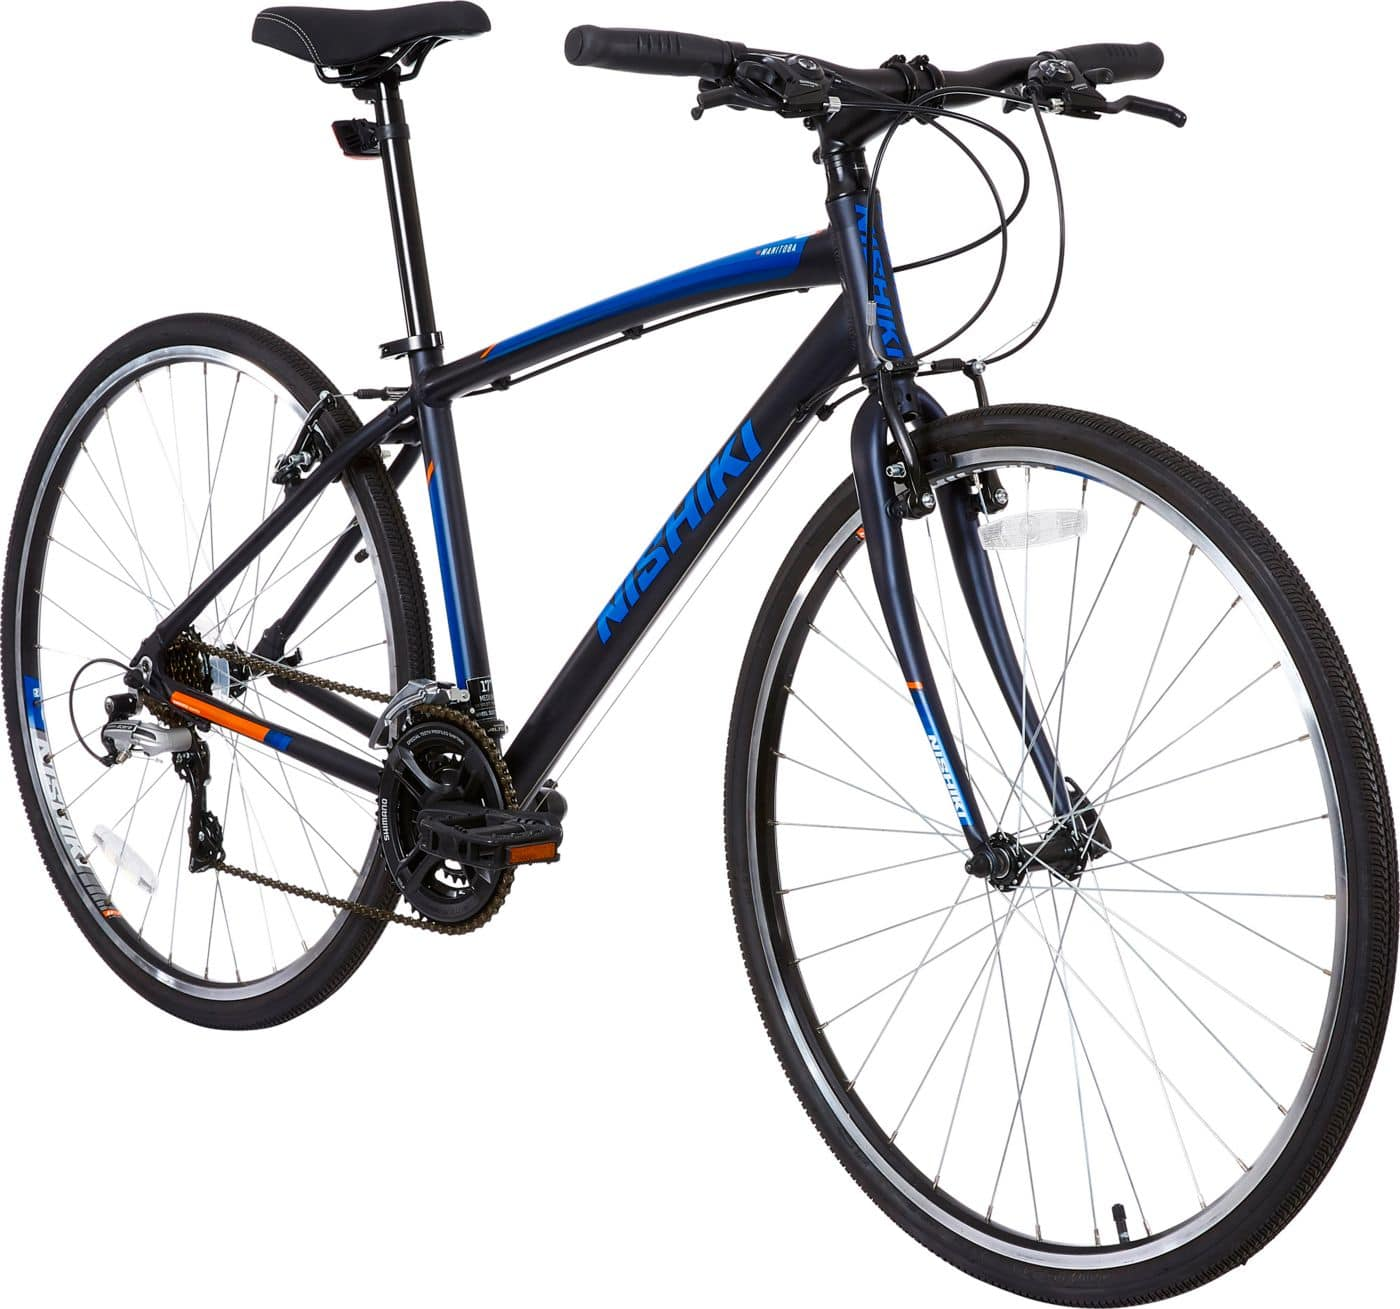 Nishiki Men's Manitoba Hybrid Bike $249.98 (Flash Sale until 10PM(PT)! Online Only!)